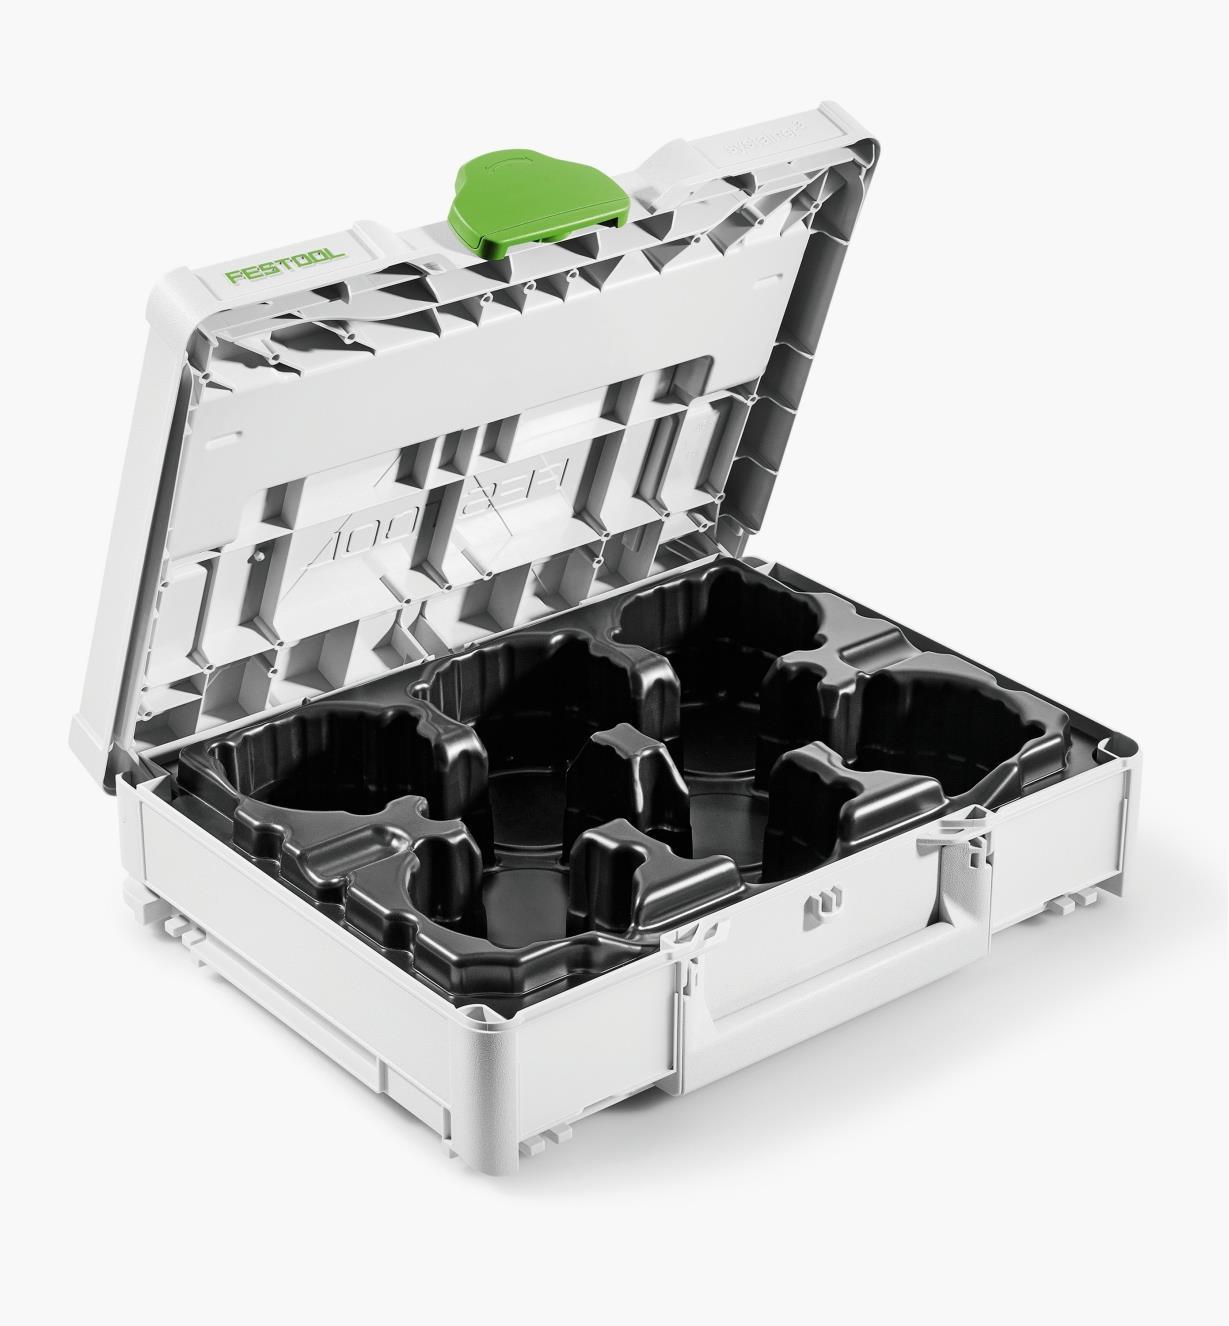 Systainer³ Case with Insert for  D77/D90/93V Abrasives